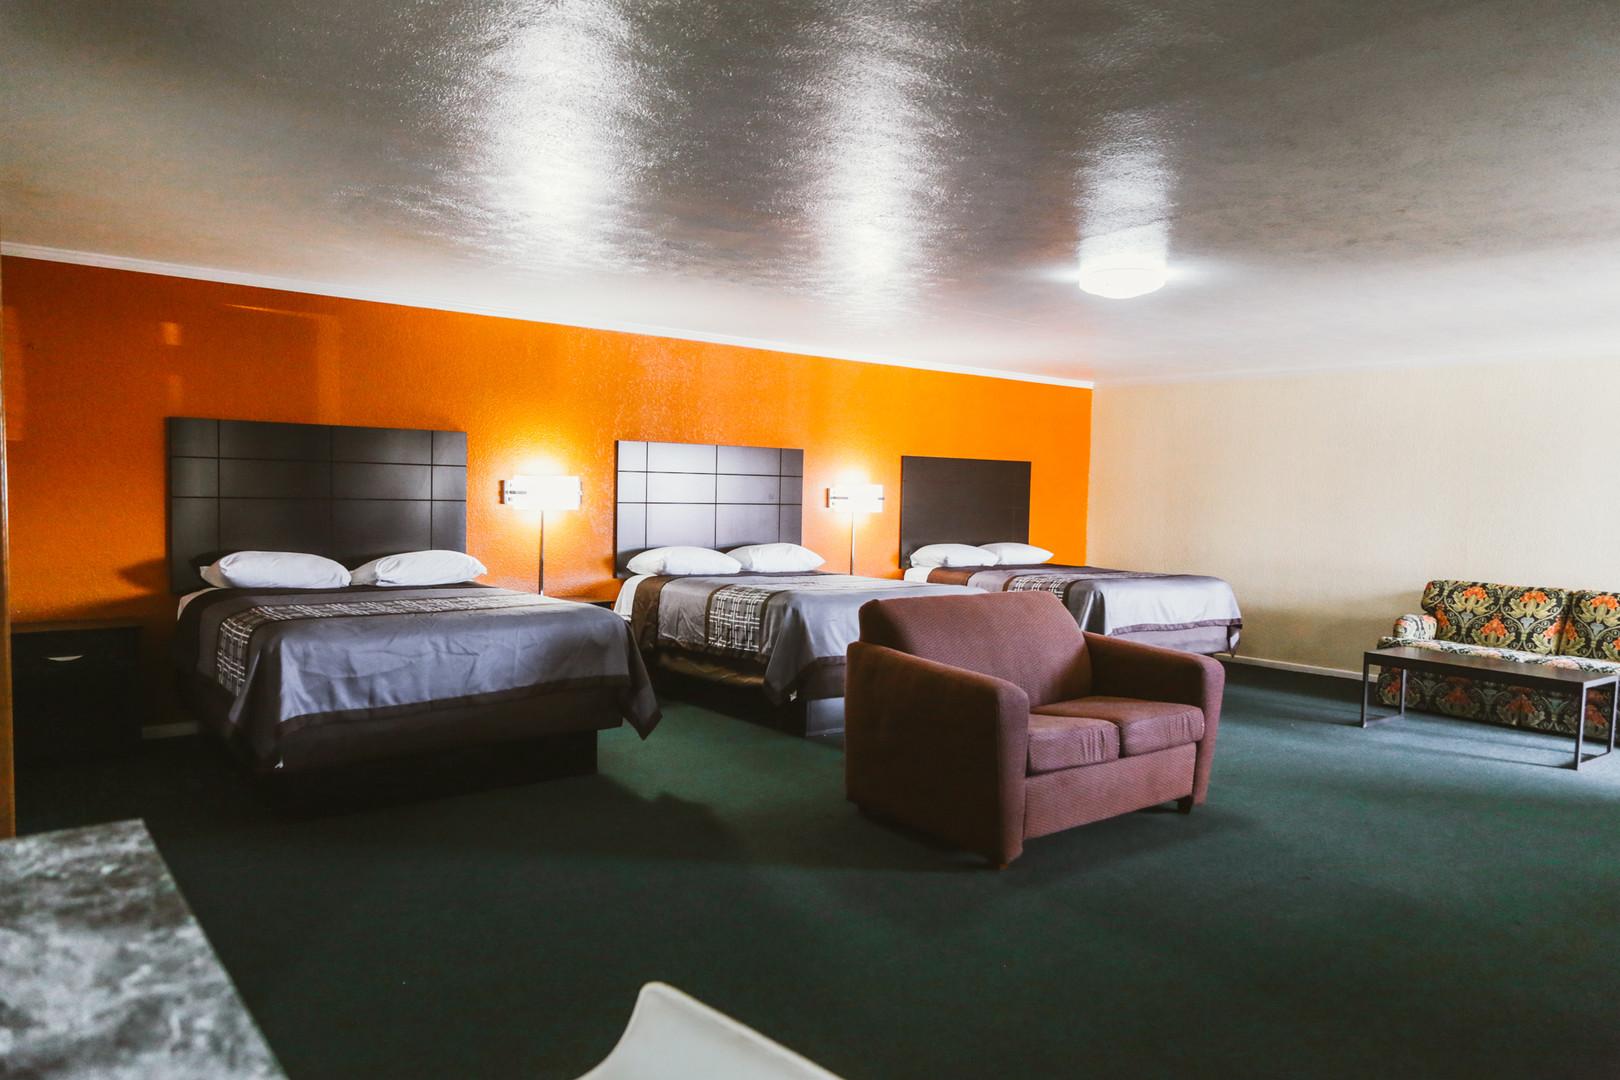 Lufkin Inn Room Photos-07.jpg